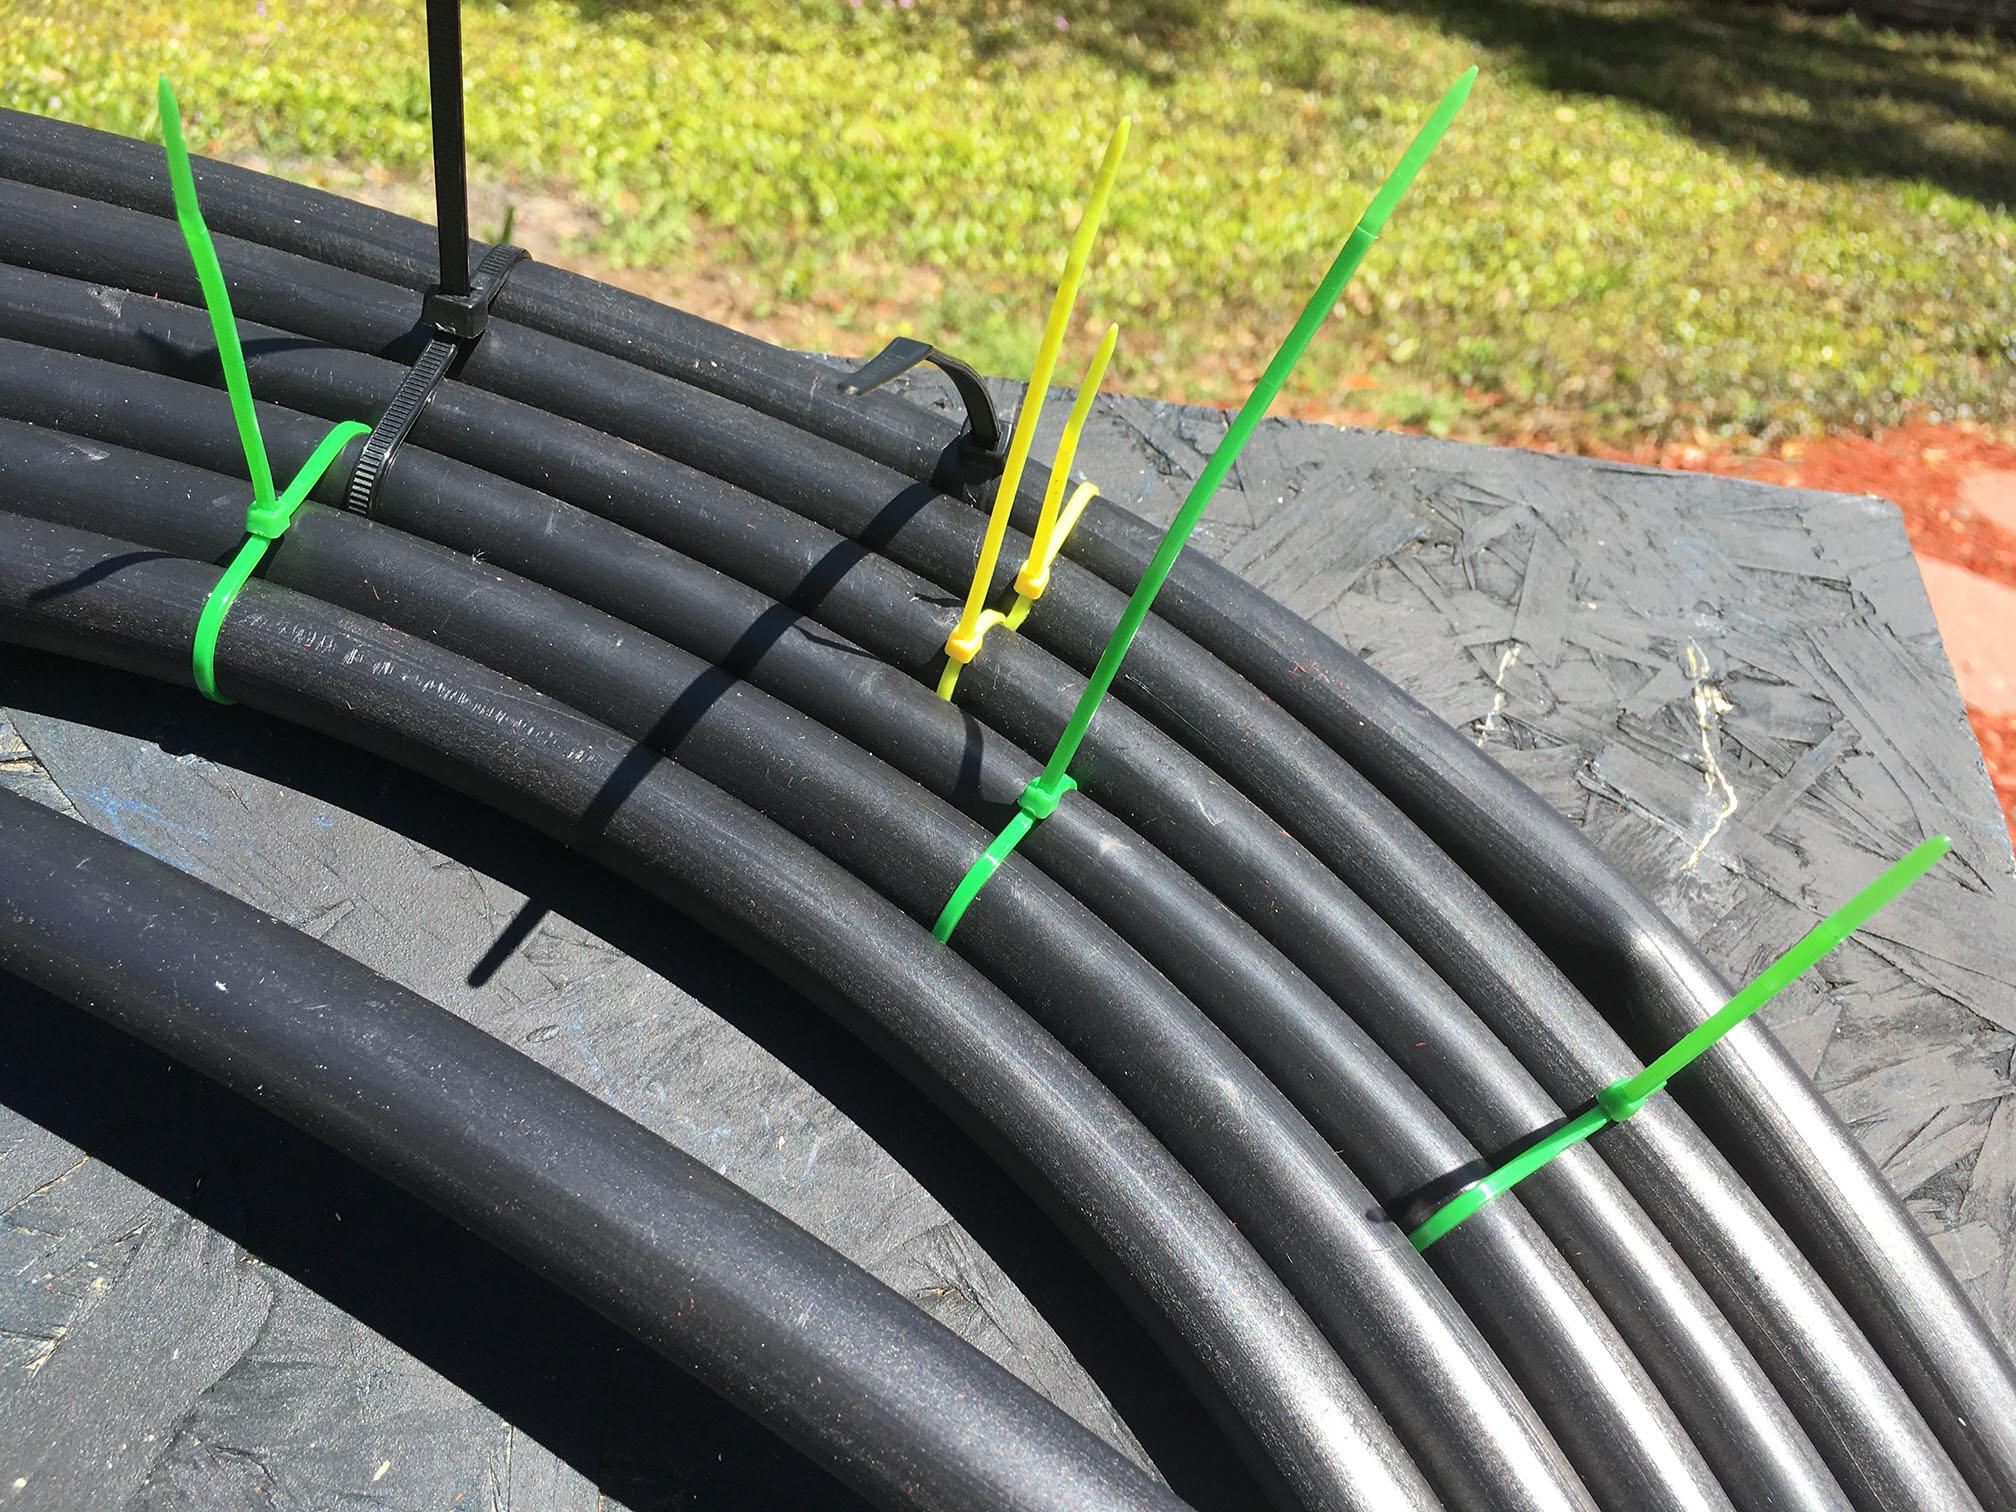 Homemade pool heater black hose homemade ftempo for Pool heater